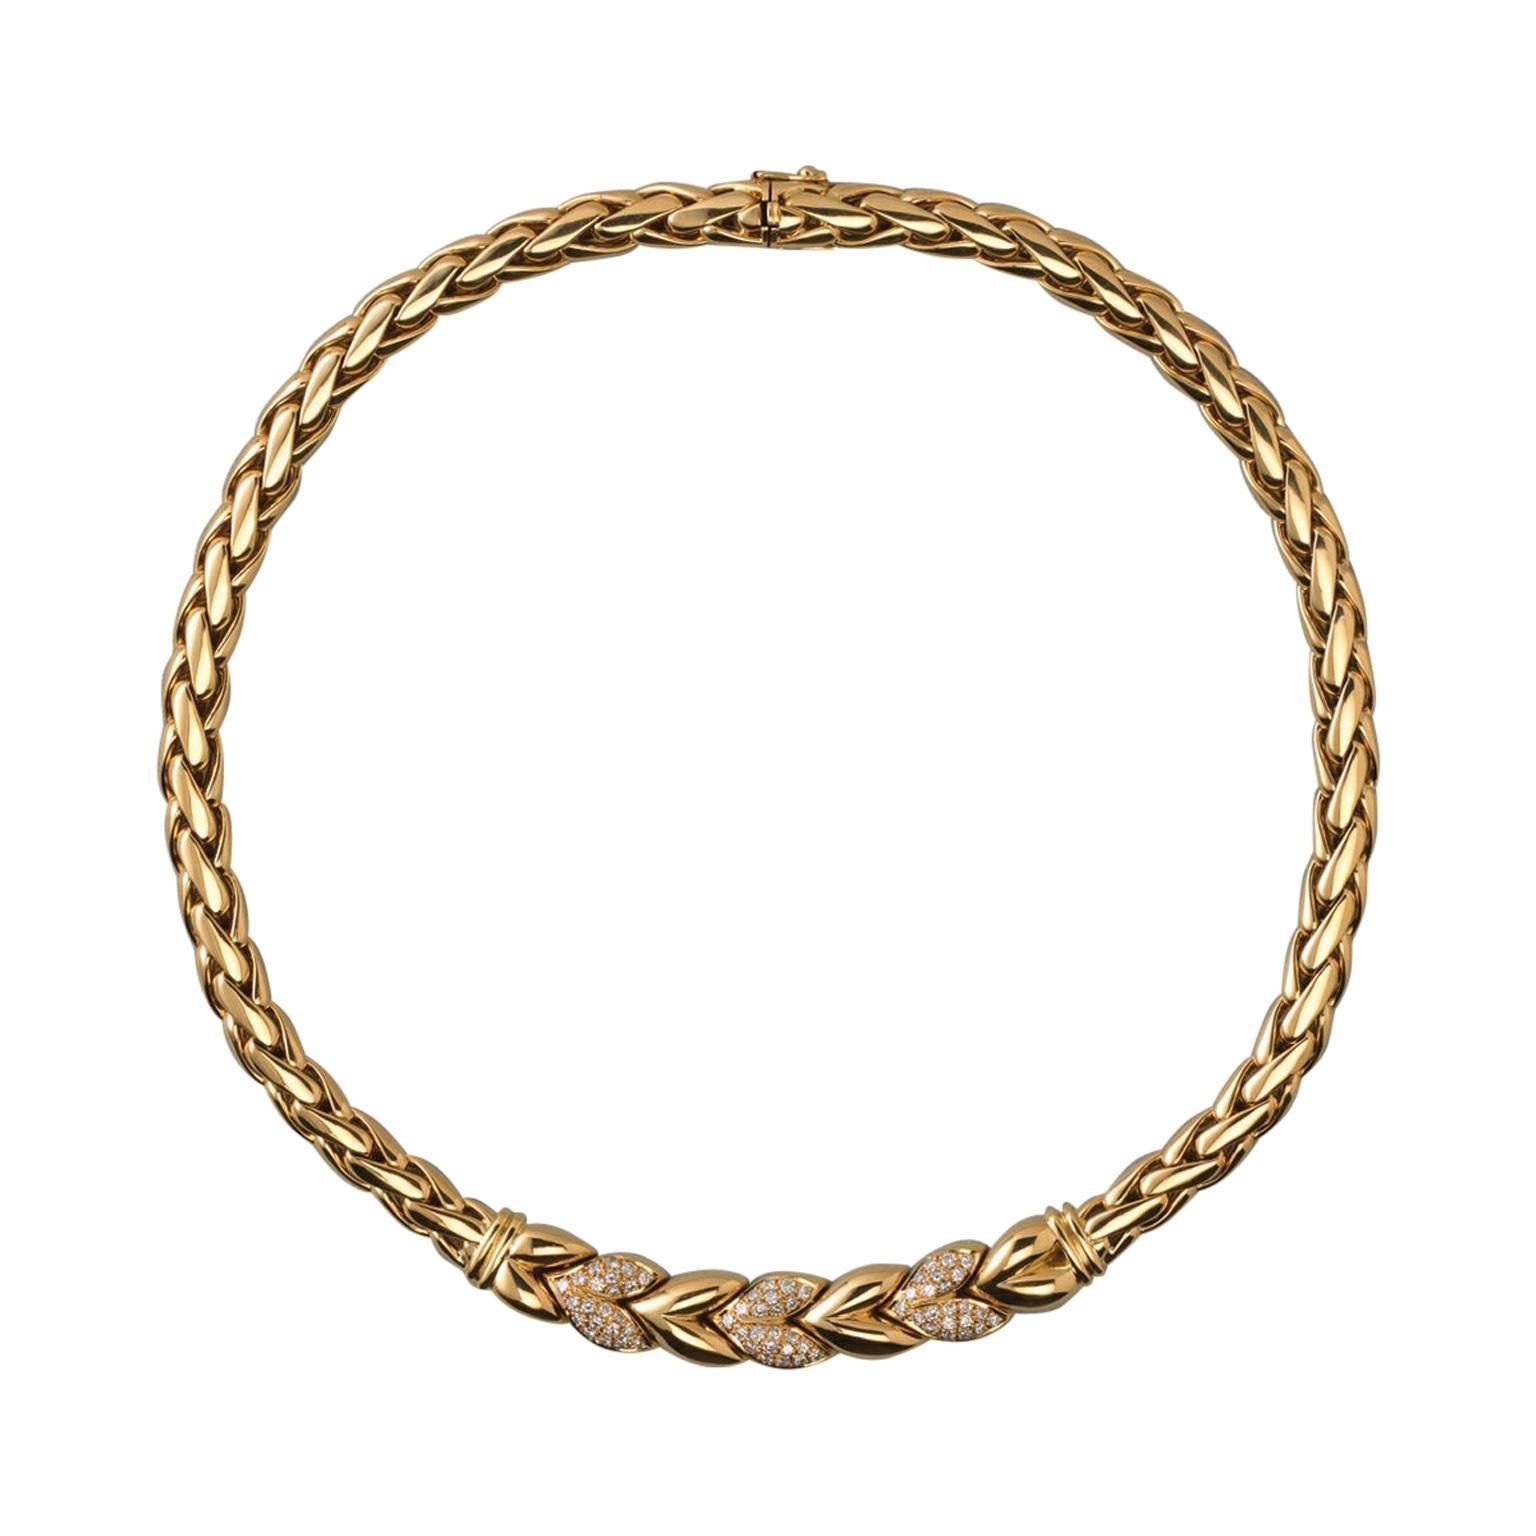 Steltman Gold and Diamond Leaf Necklace